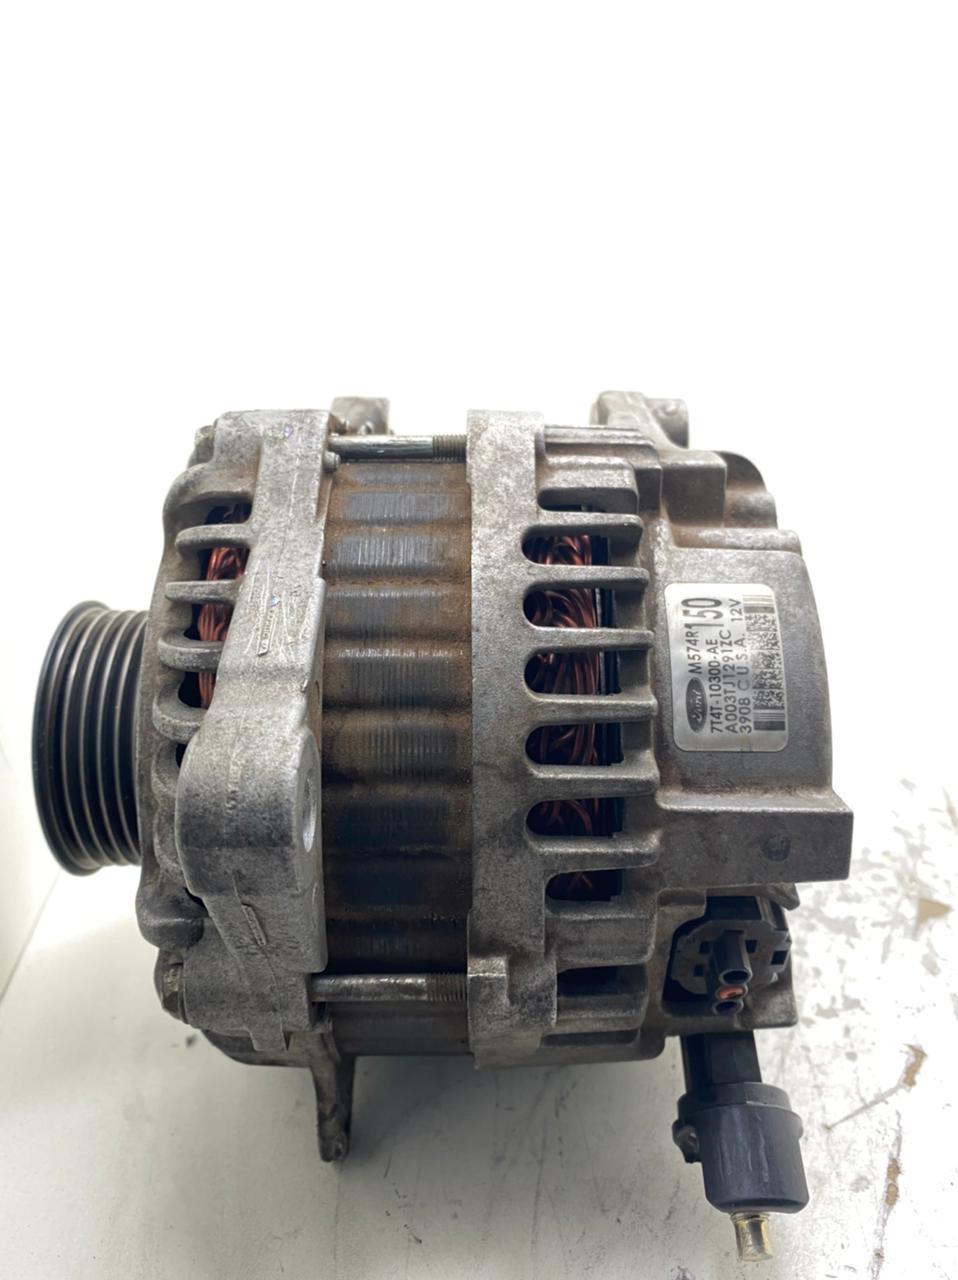 ALTERNADOR FORD EDGE 3.5 V6 12V 150AMP A003TJ2891ZC 8G1T10300AD M574R A003TJ1291ZC 7T4T10300AE 7T4T10300AE